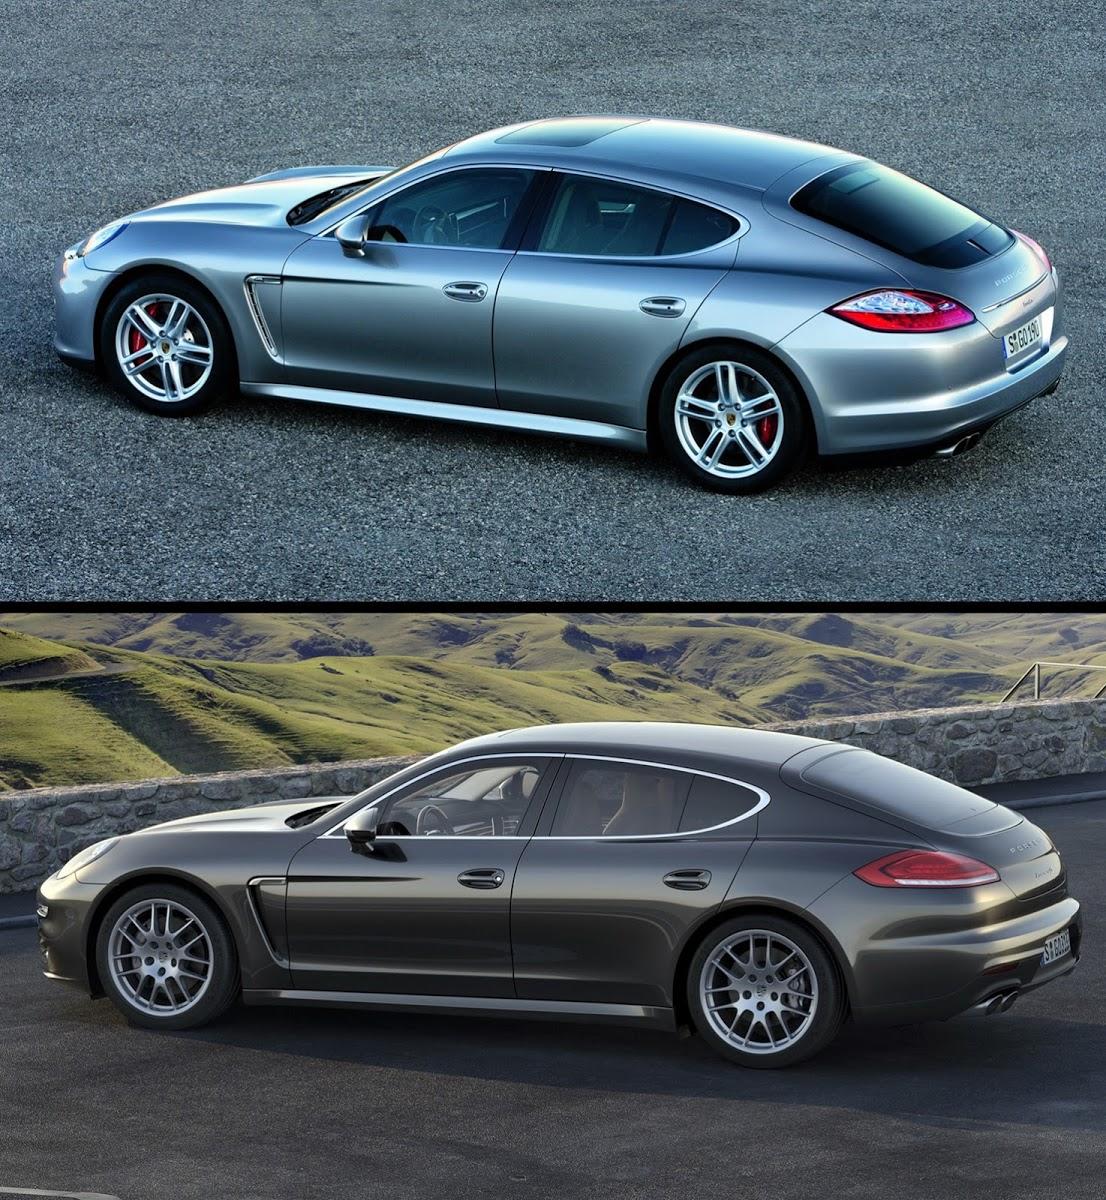 Porsche Panamera Car: Has The Facelift Done The Trick For The Porsche Panamera